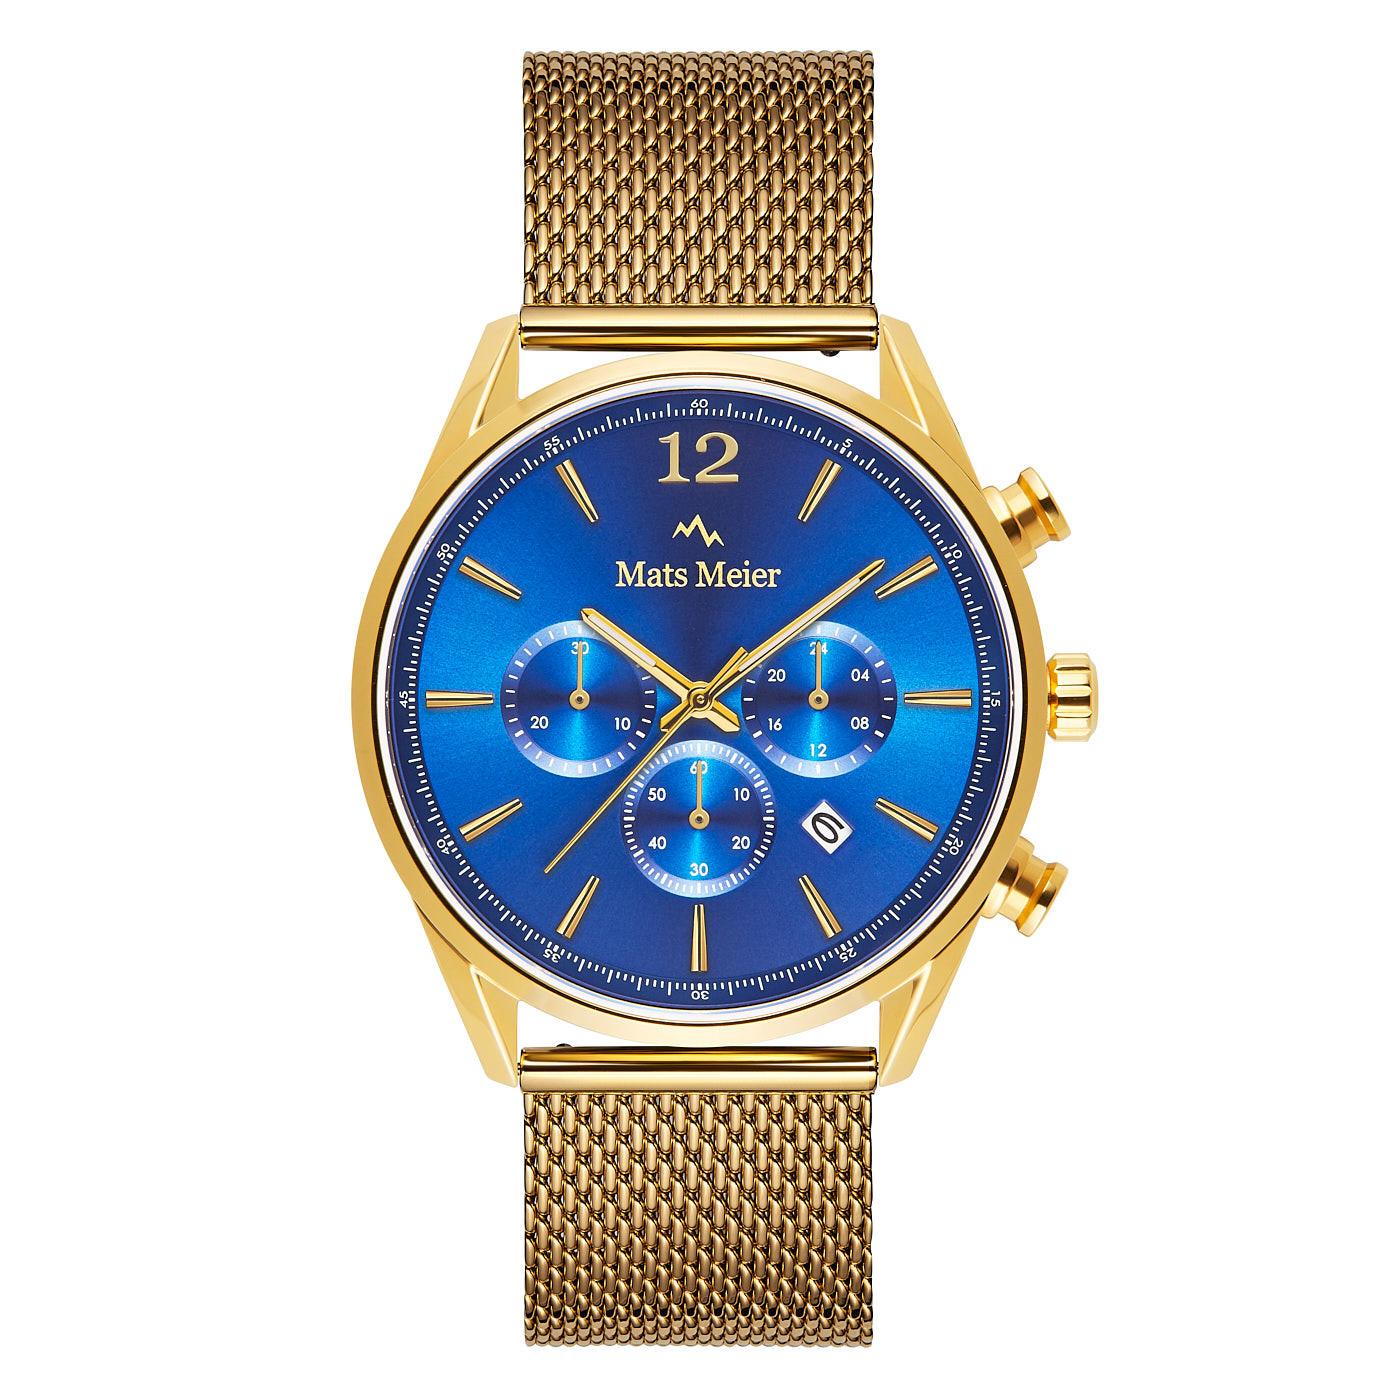 Mats Meier Grand Cornier chronograph mens watch blue / gold colored mesh